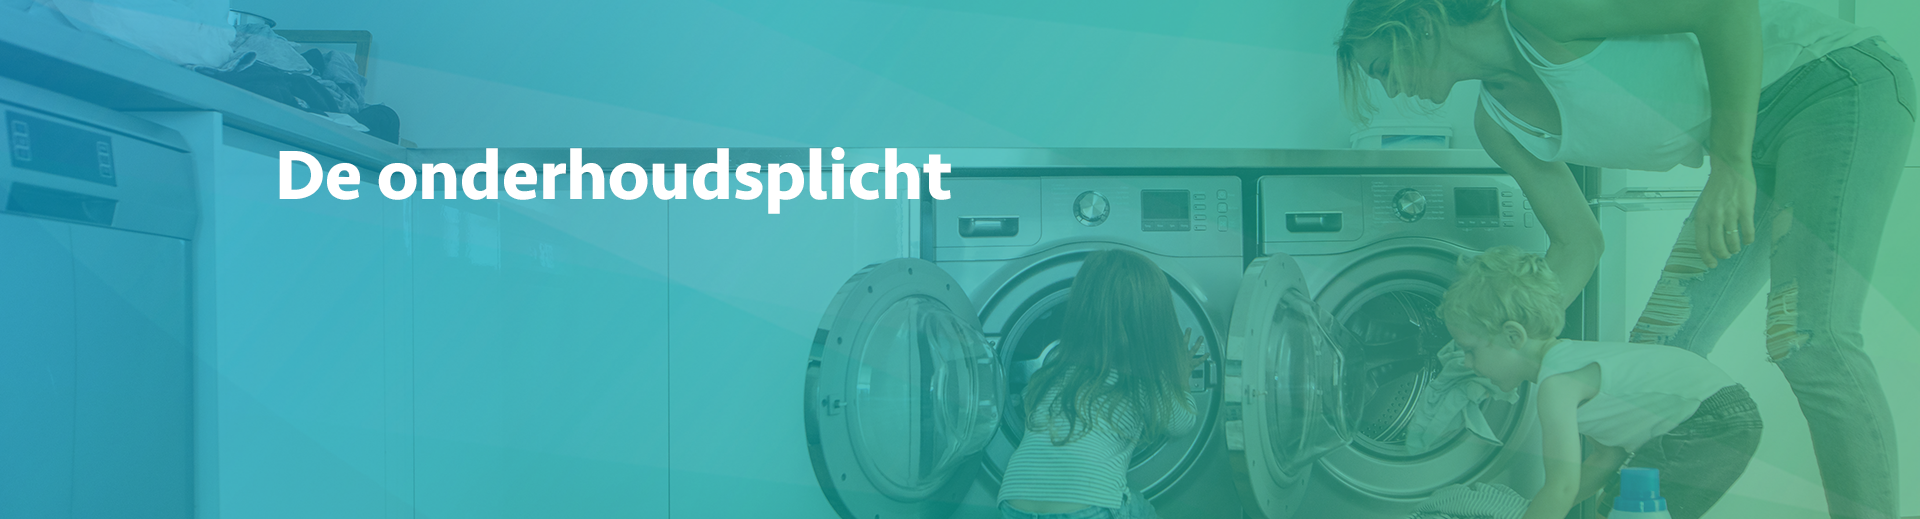 De onderhoudsplicht - Scheidingsplanner Midden-Nederland